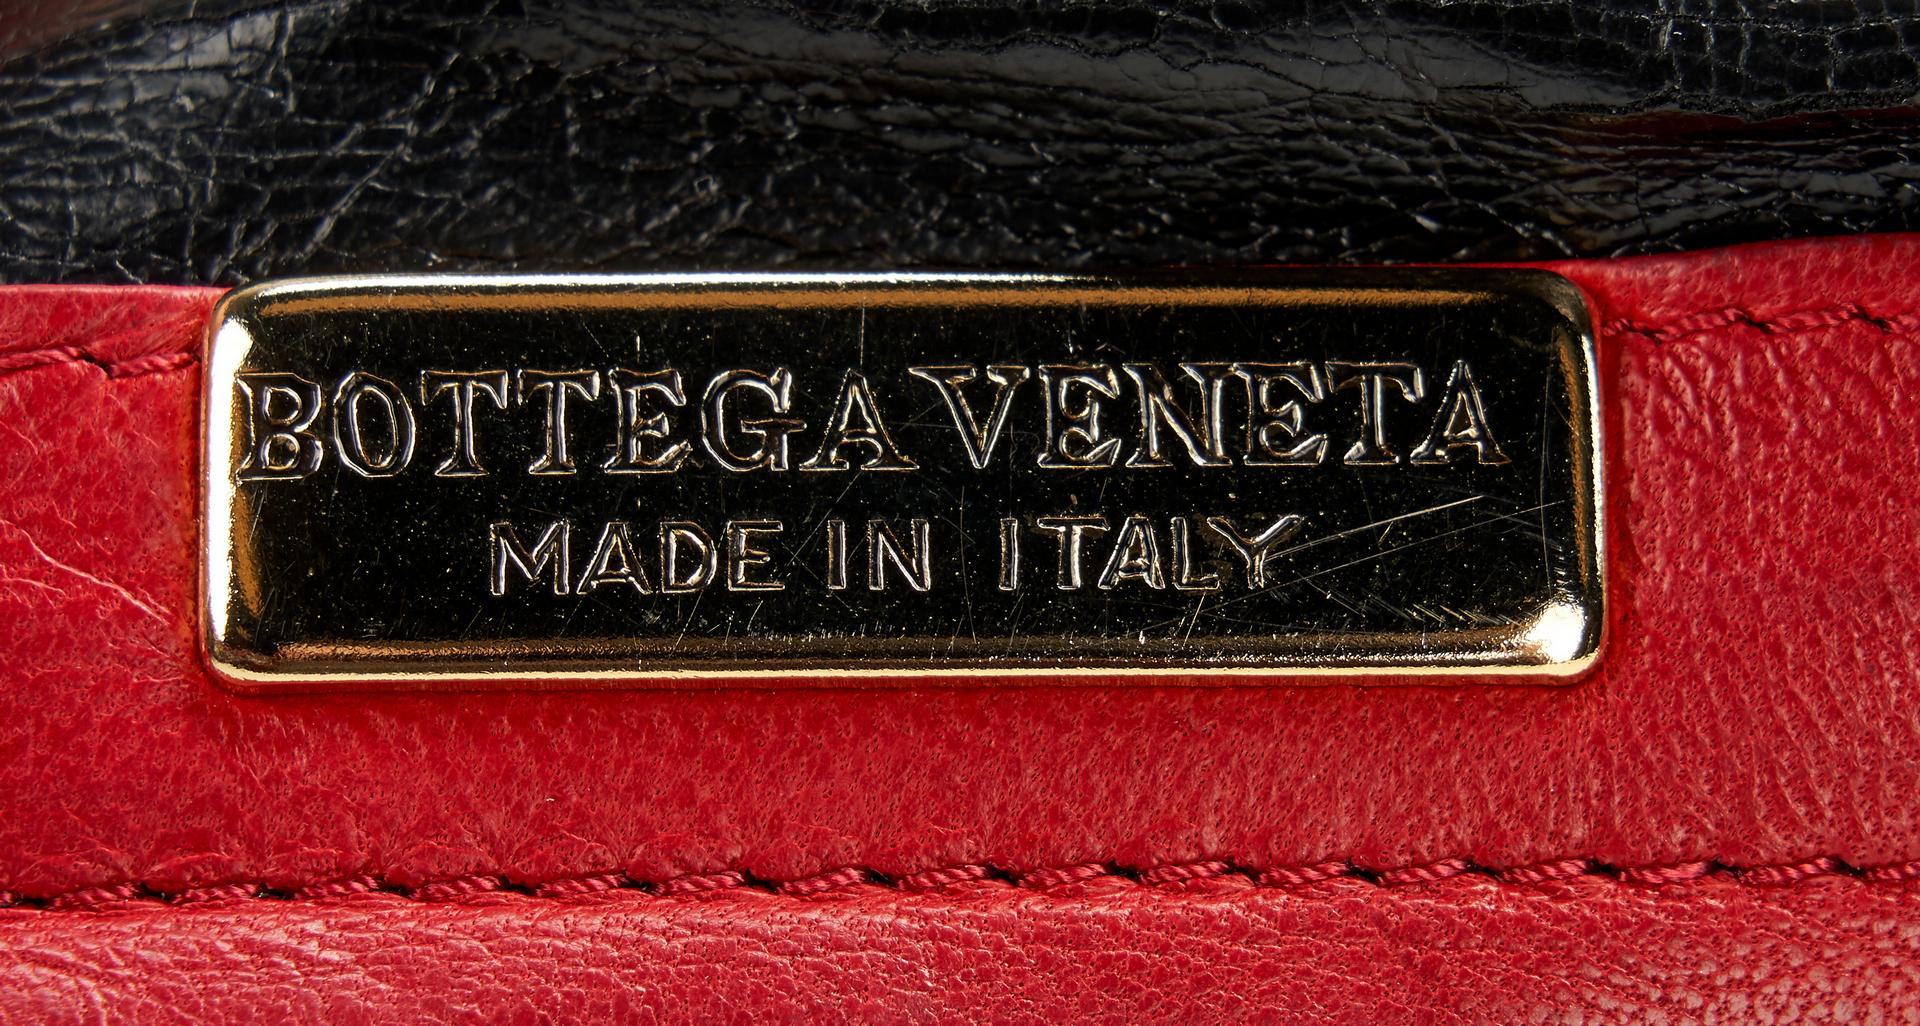 Lot 711: 3 Bottega Veneta Items, incl. Creel Bag